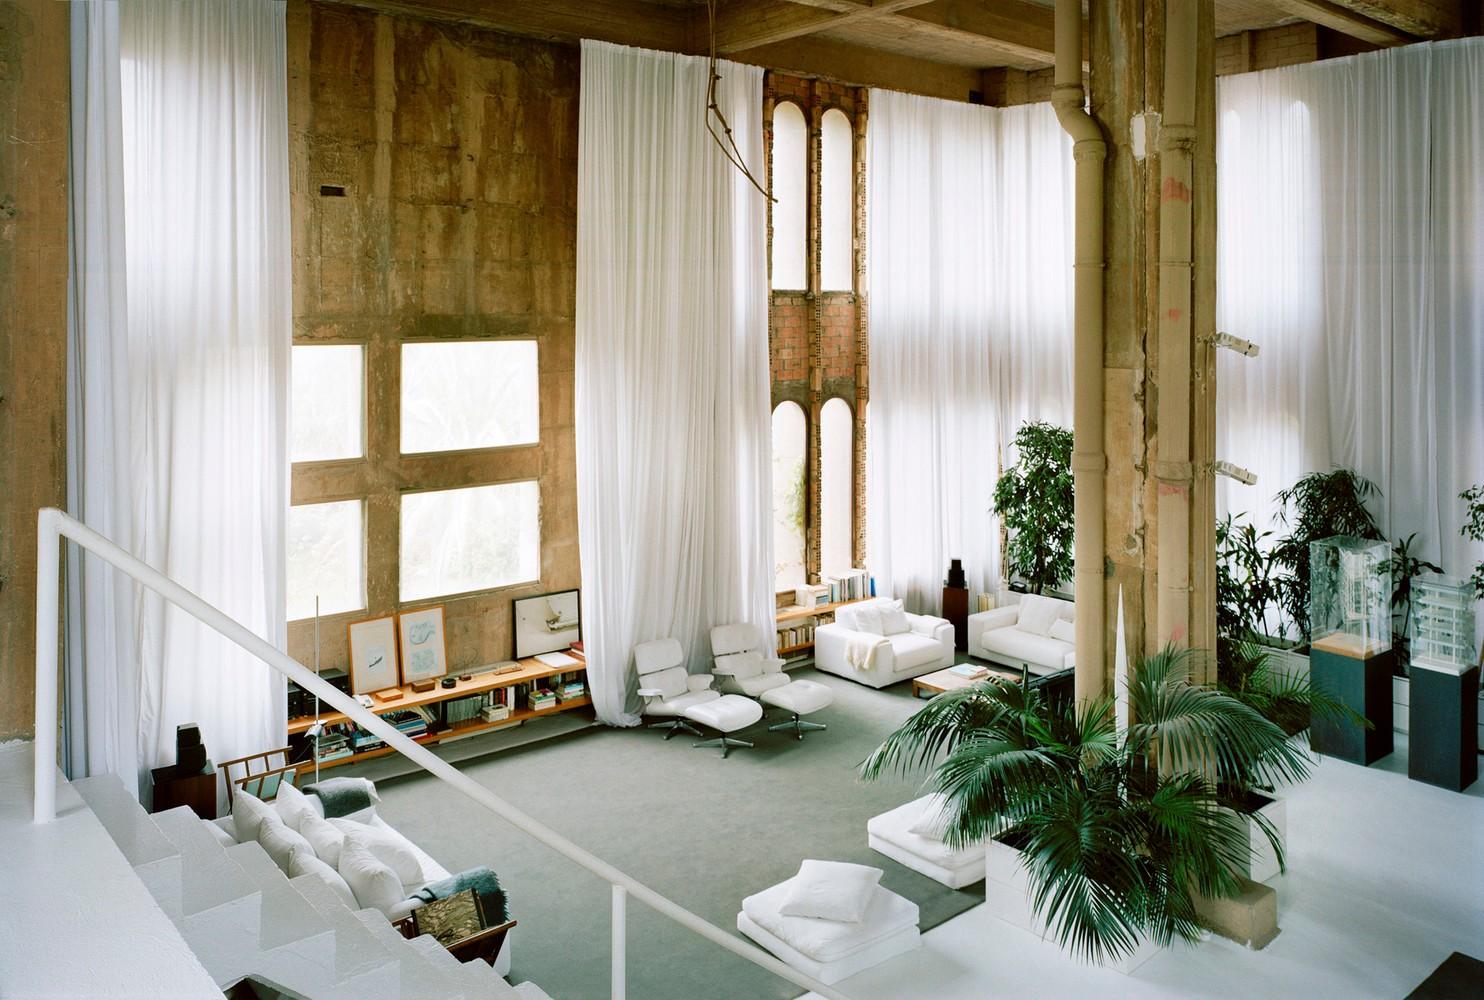 ricardo_bofill_taller_arquitectura_santjustdesvern_barcelona_spain_privatespaces_-7-.jpg